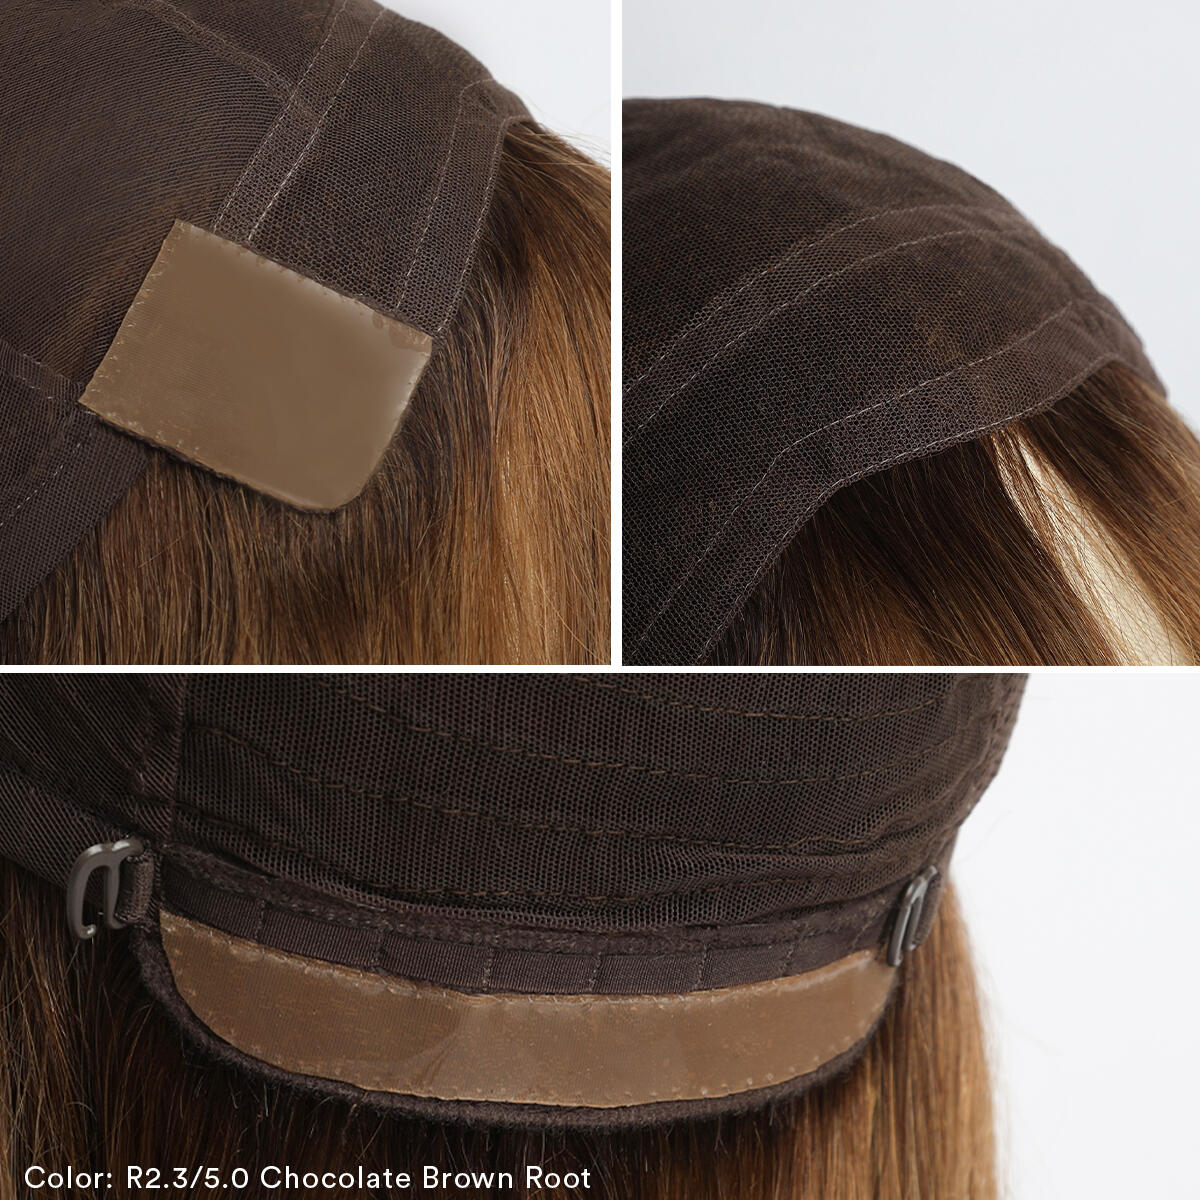 Lace Wig R7.3/8.0 Cendre Golden Blonde Root 35 cm